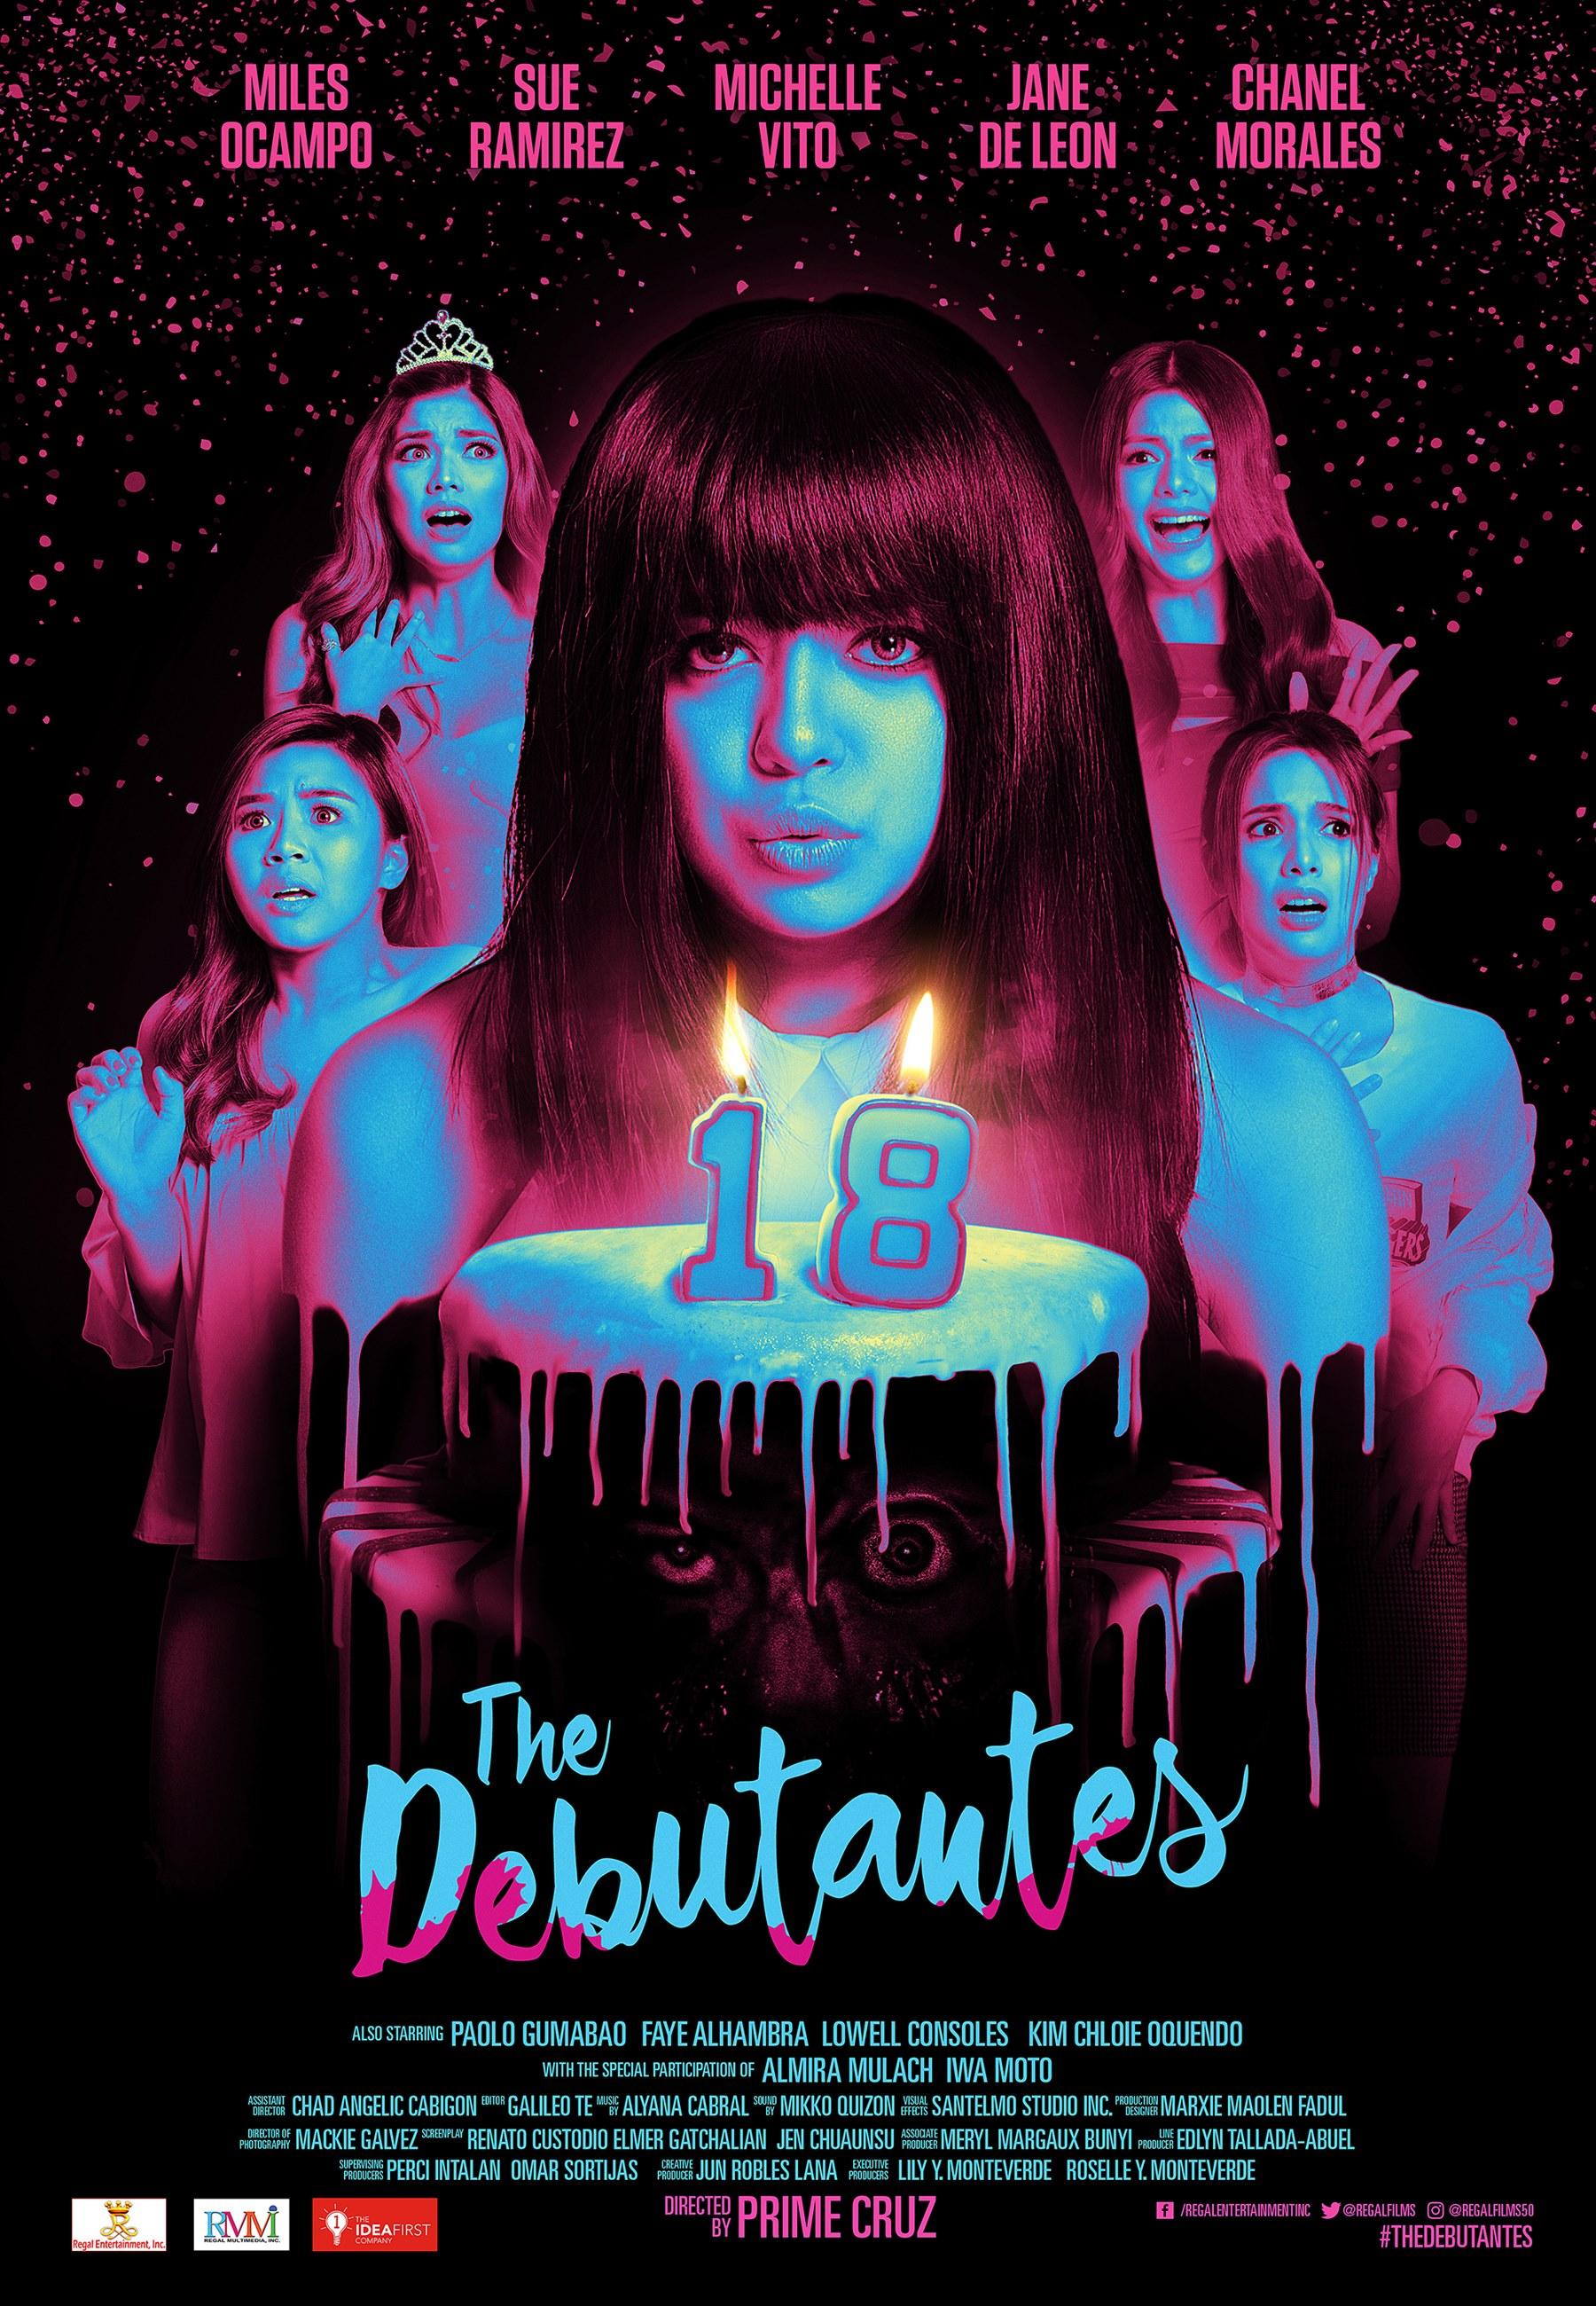 The Debutantes Poster